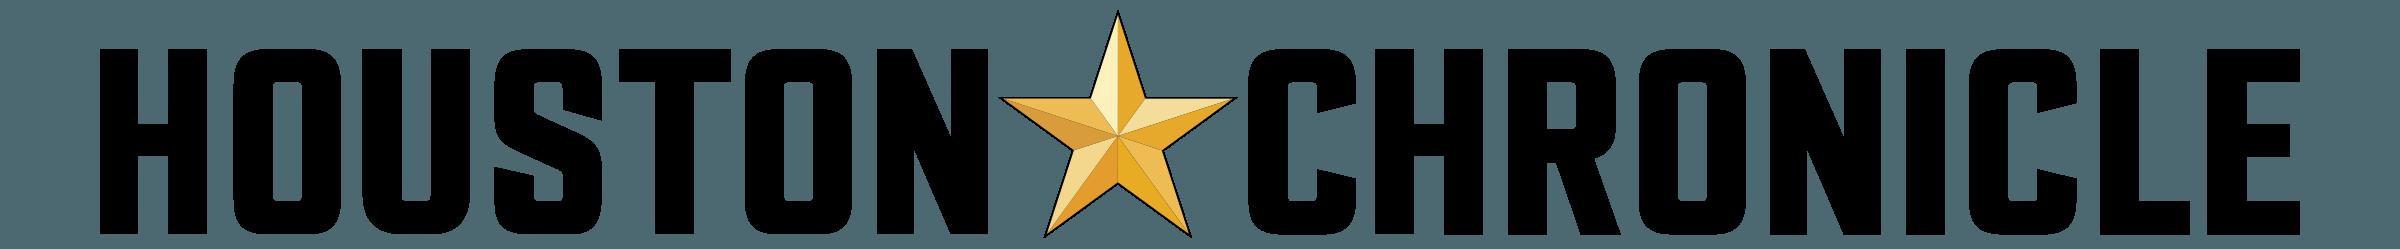 houston-chronicle-logo-transparent.png